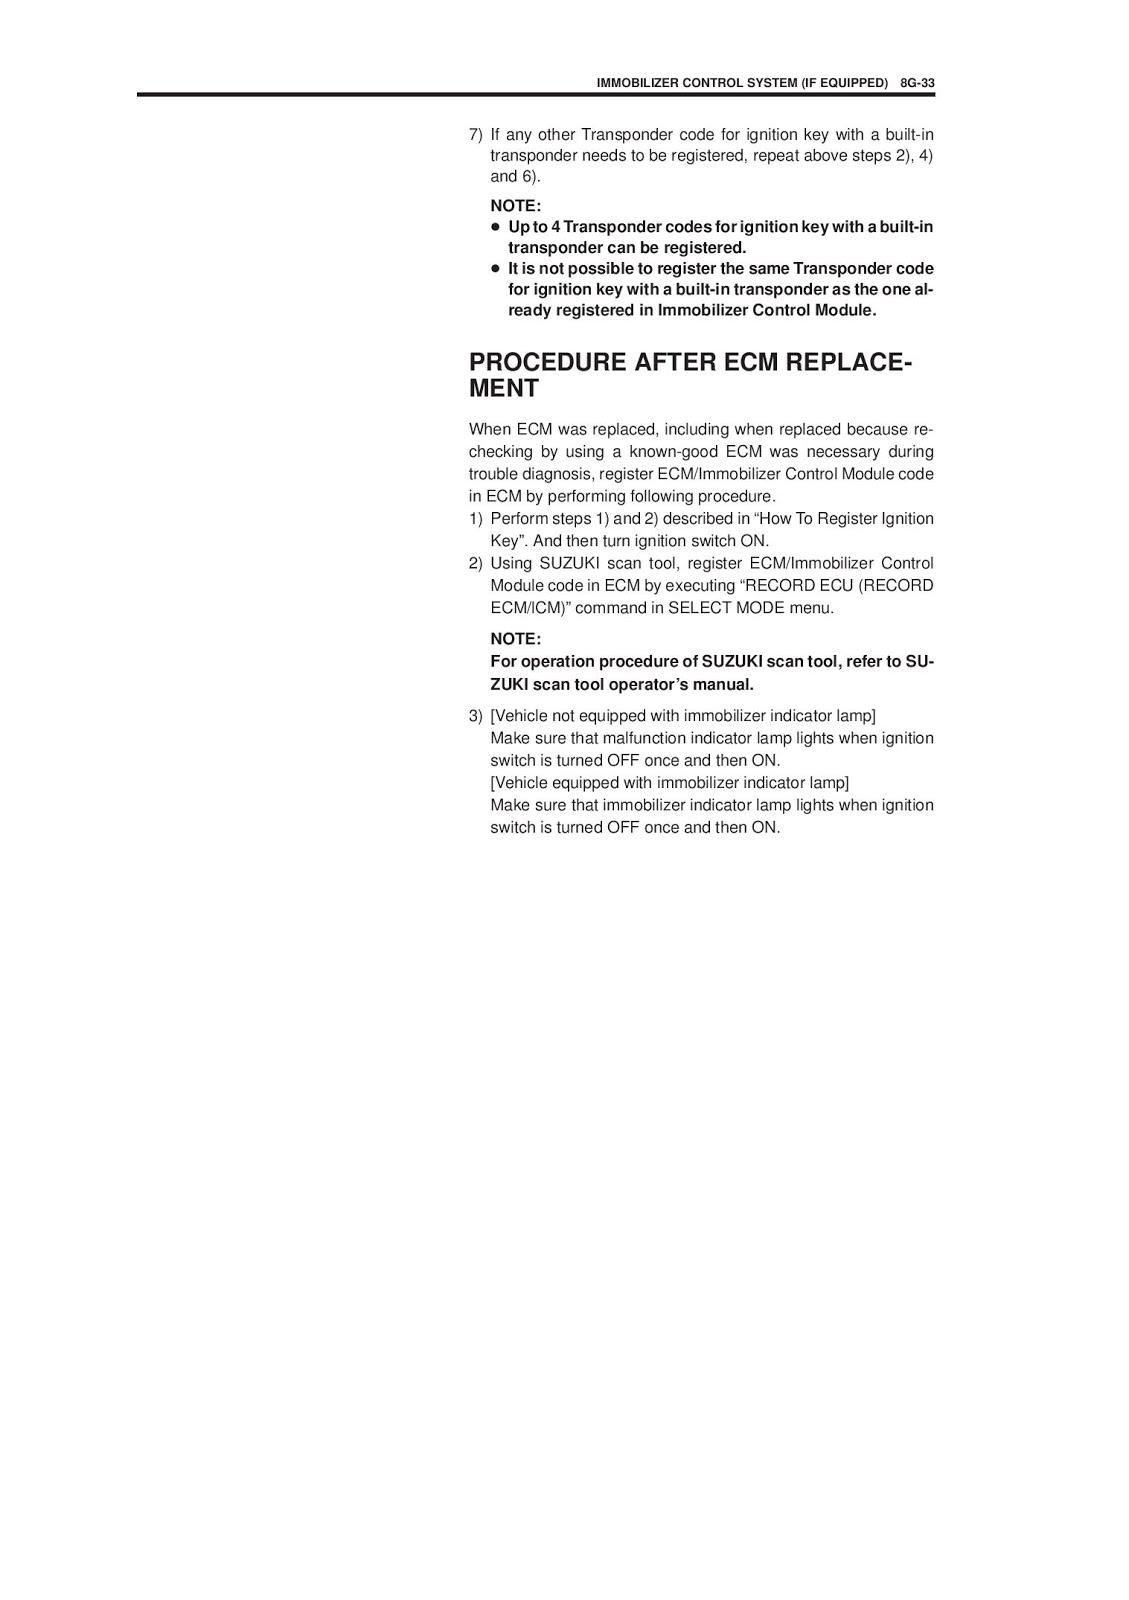 suzuki jimny service manual סוזוקי גימני ספר שירות אחזקה